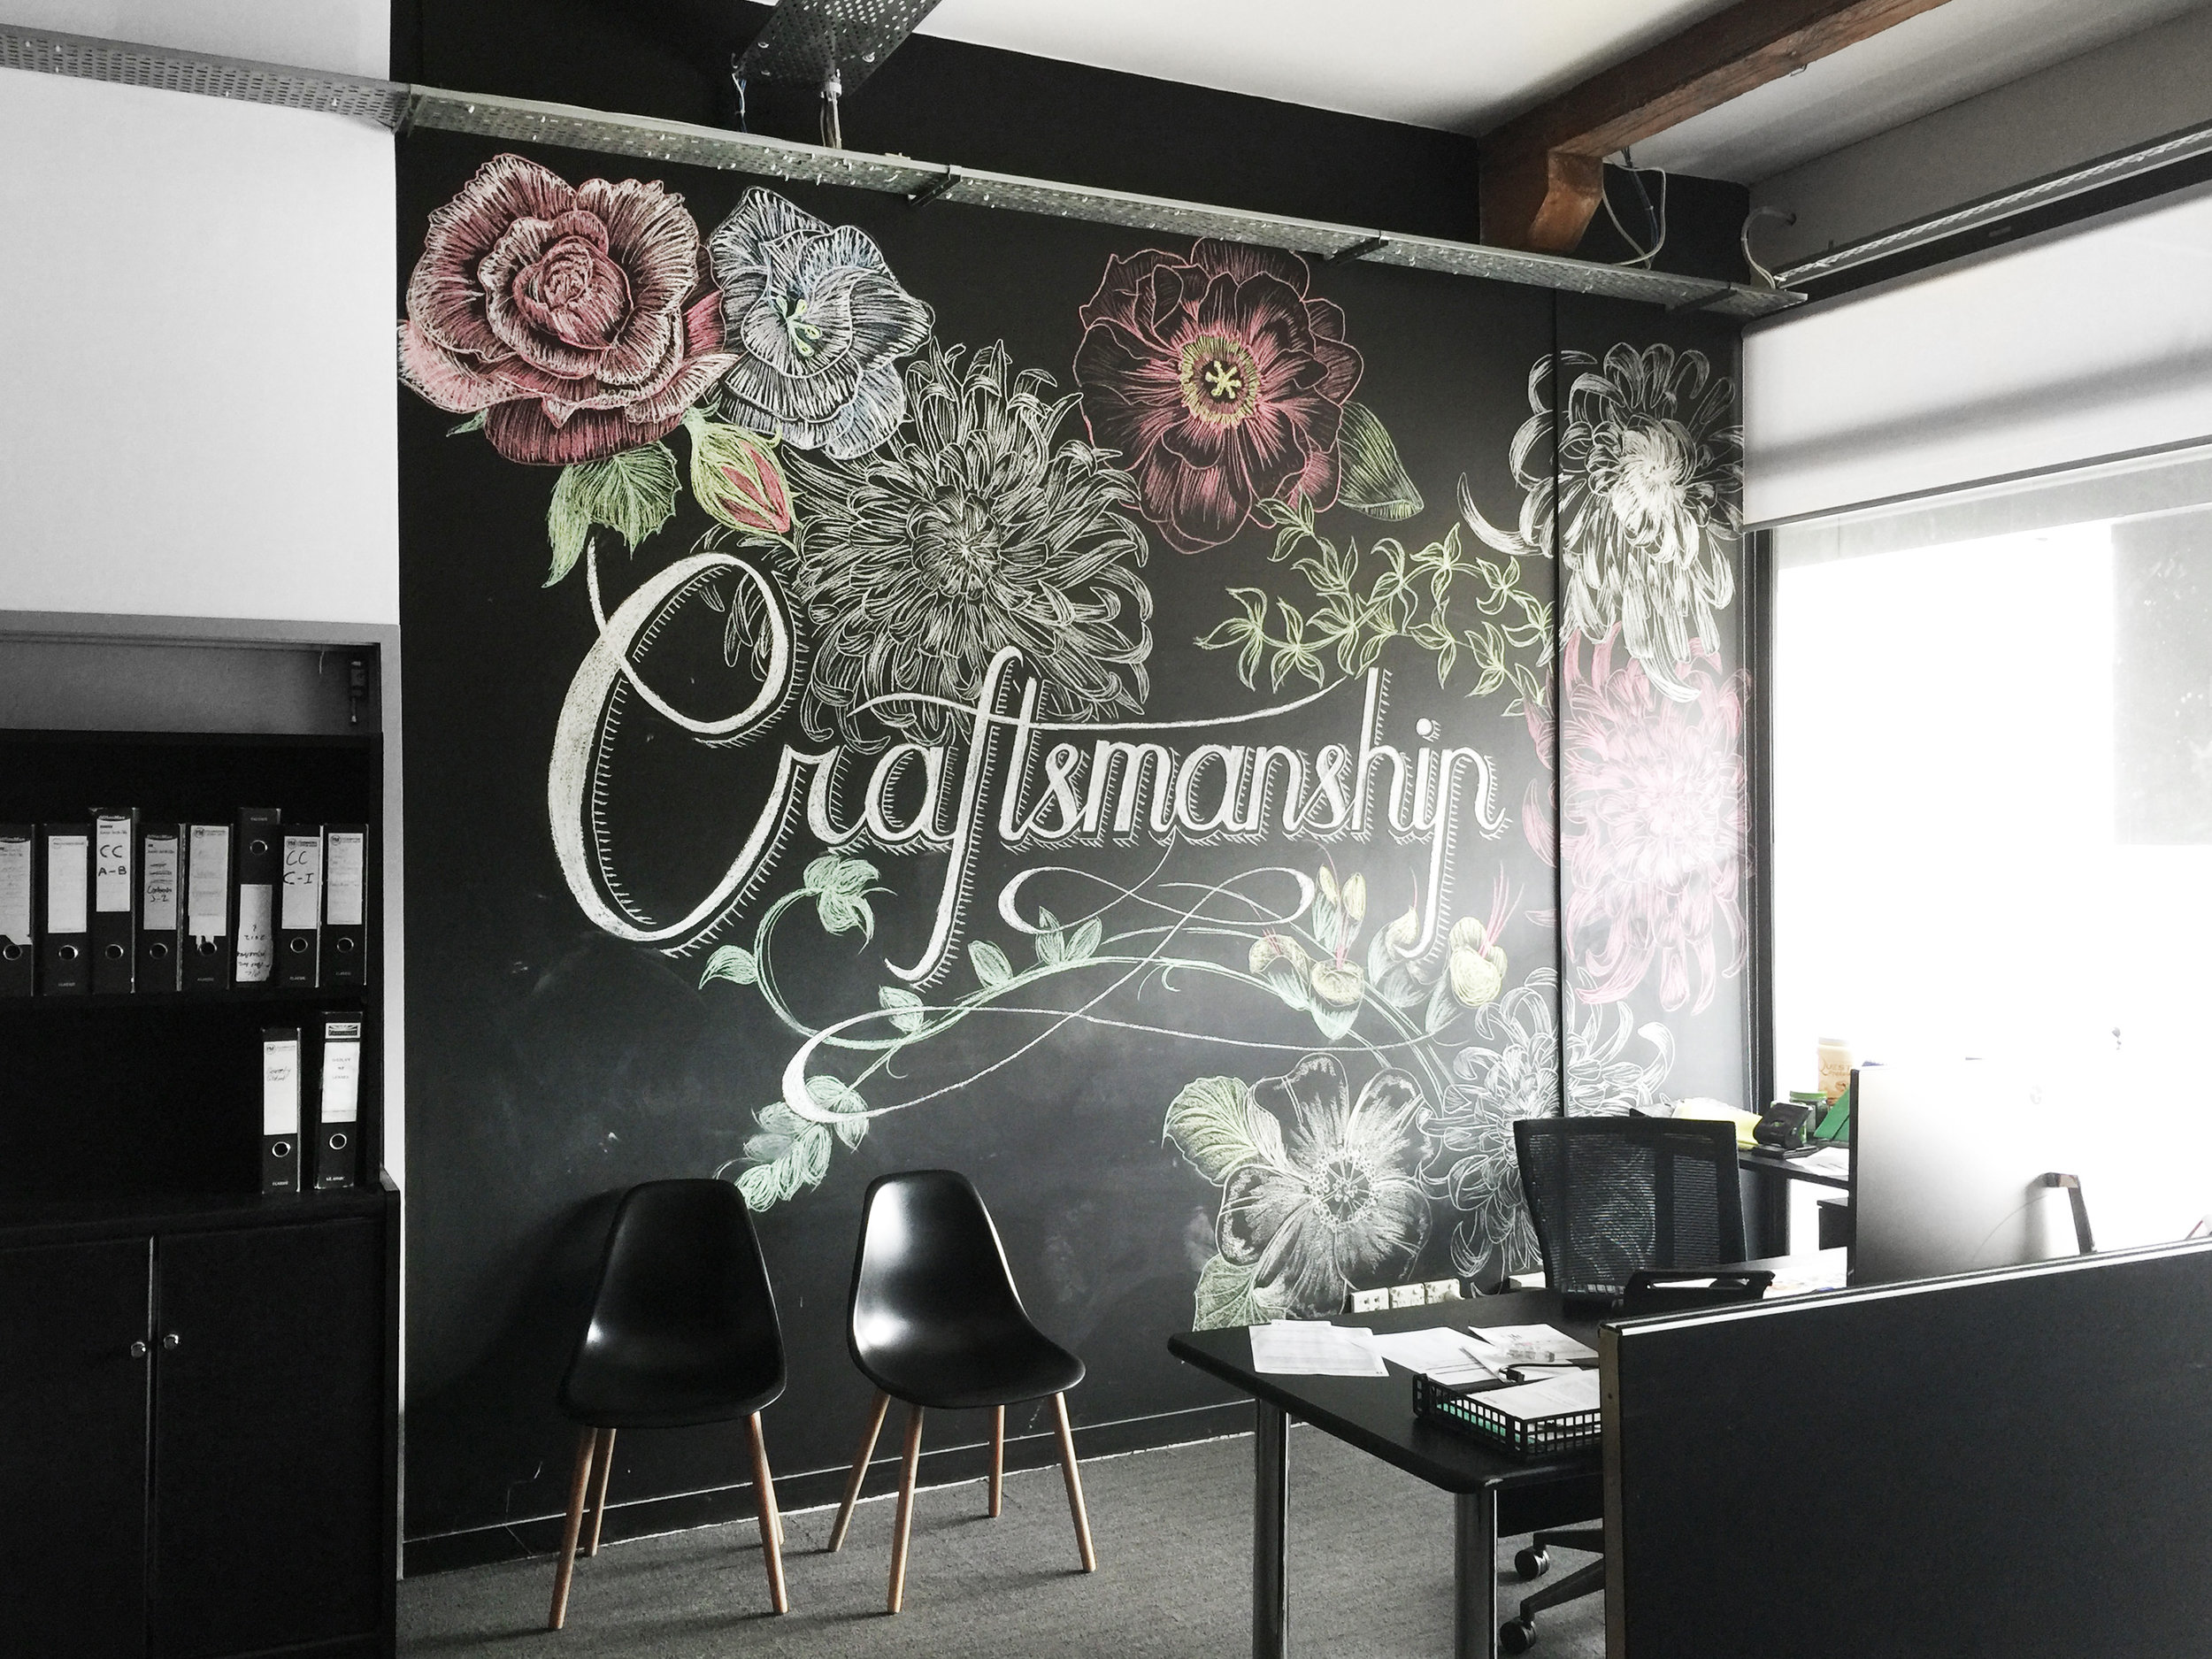 Craftsmanship-Wall.jpg